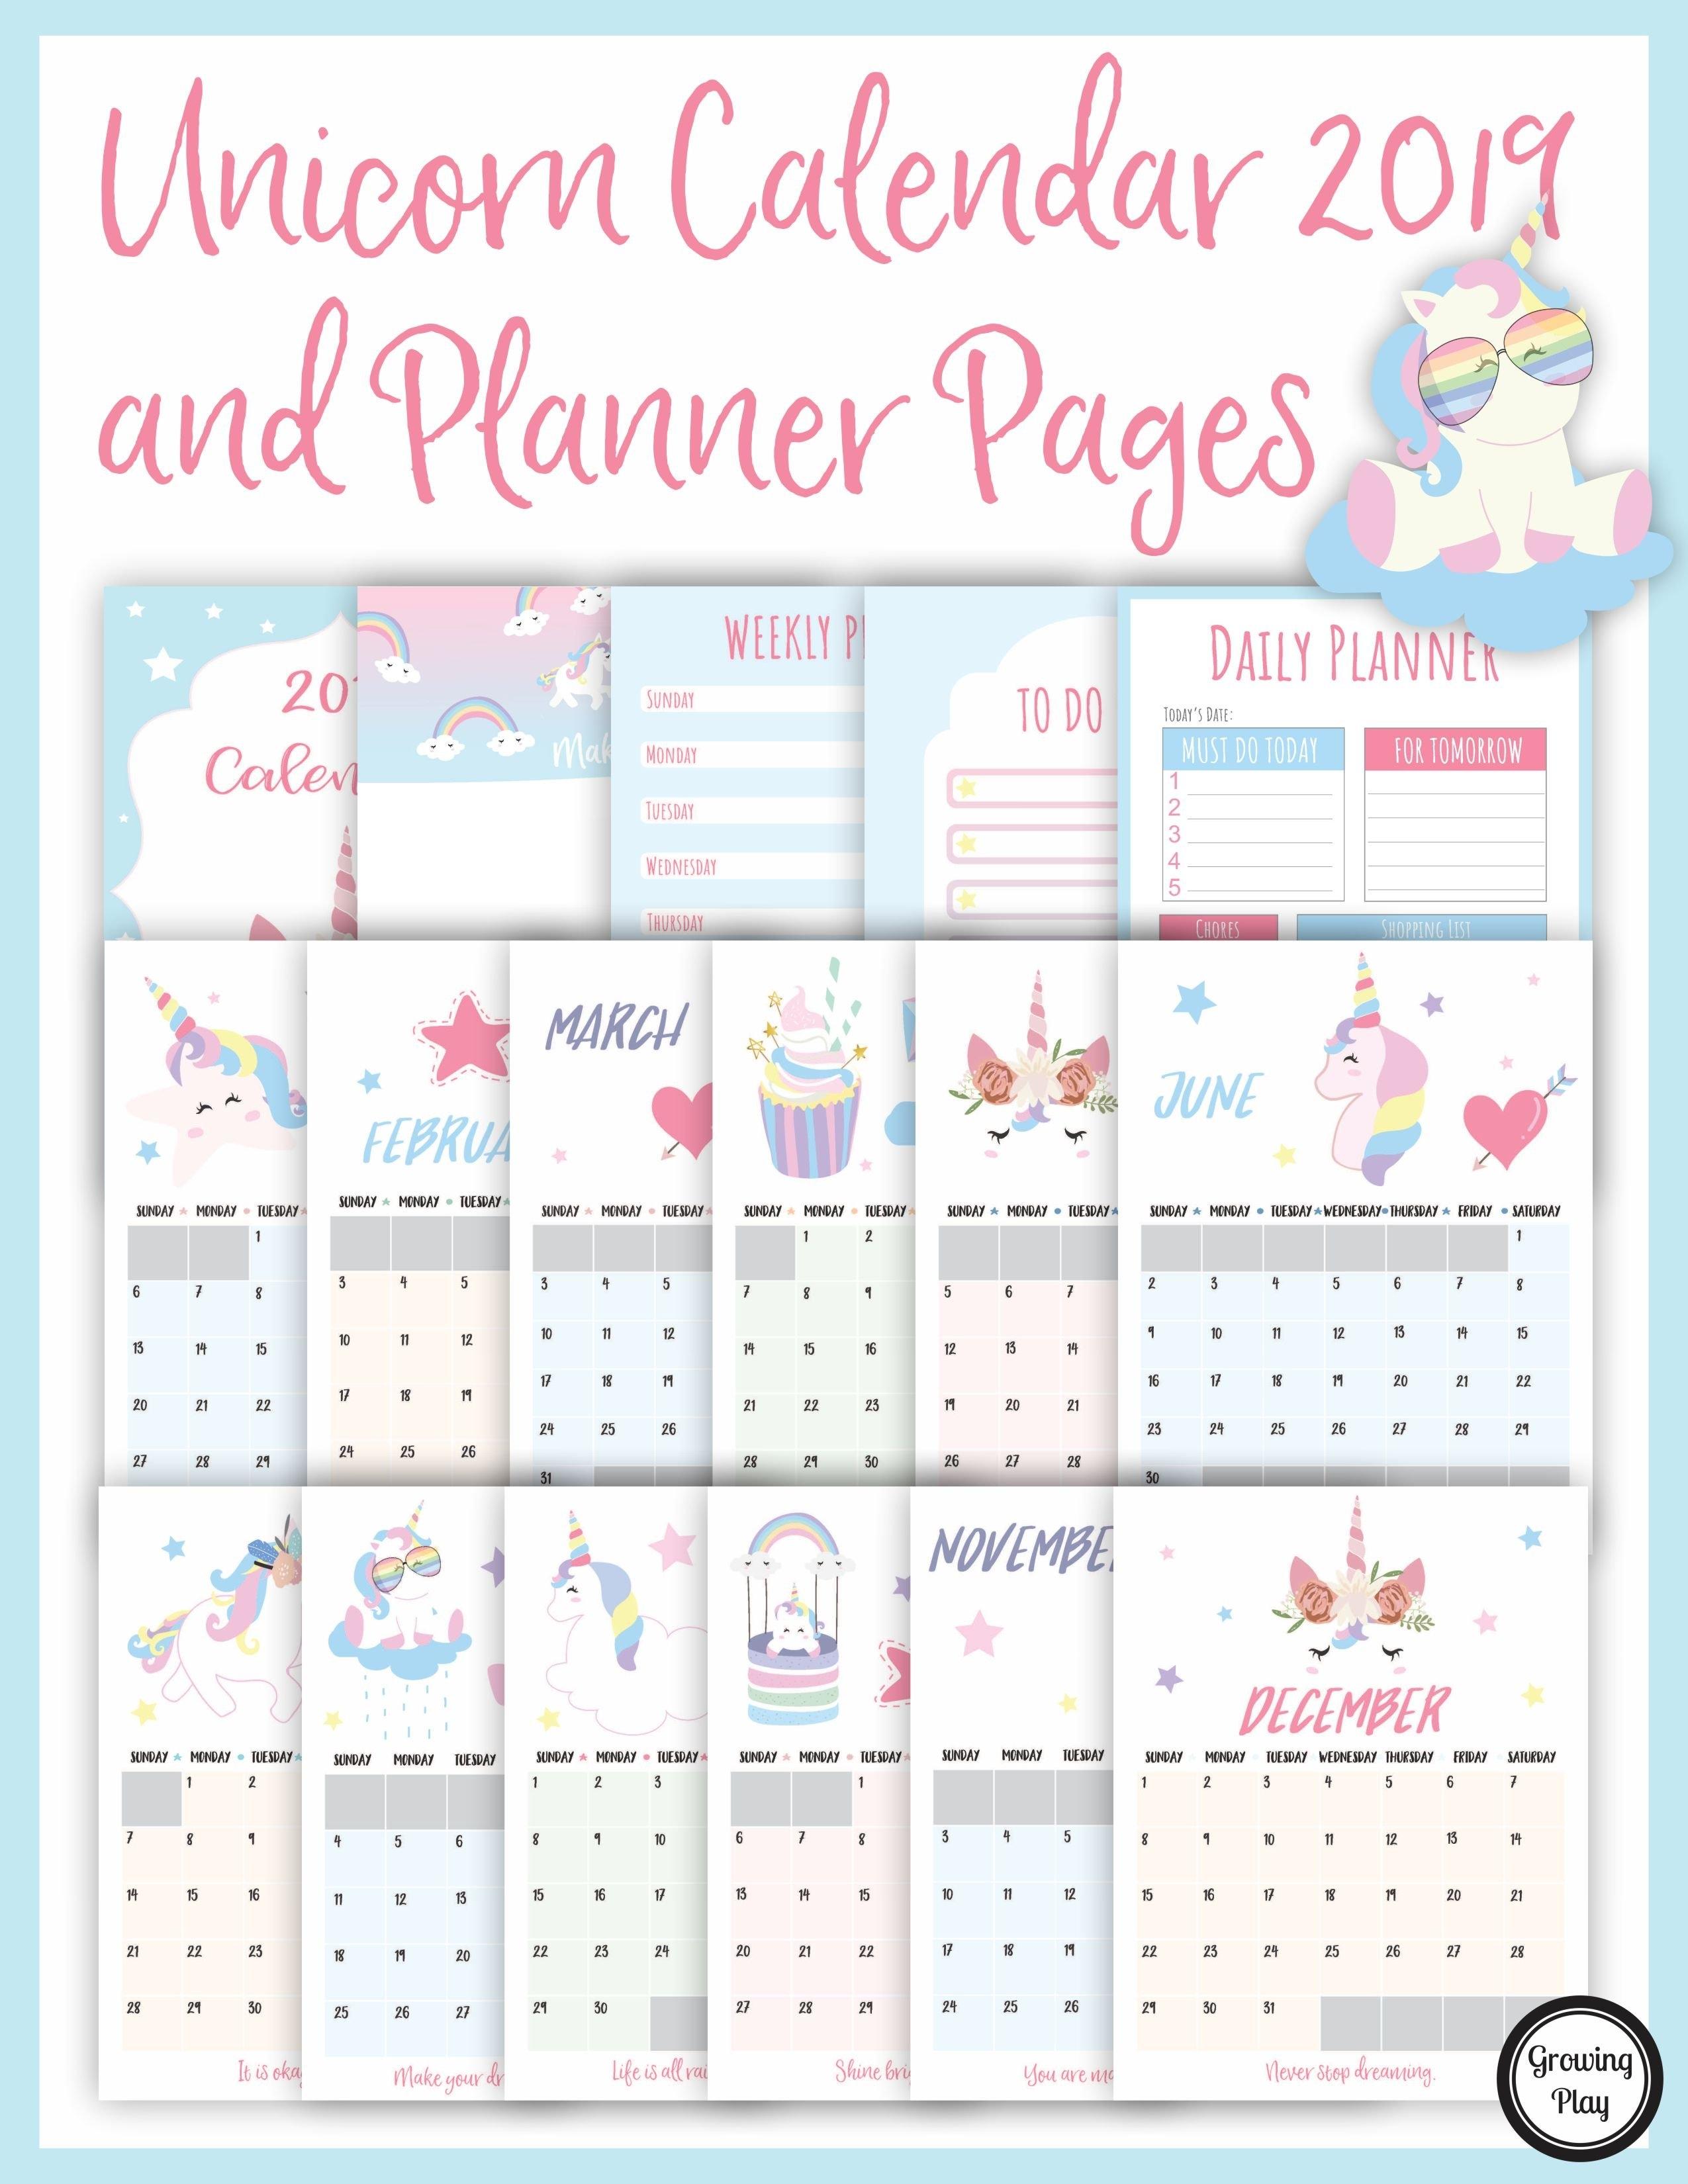 Unicorn Calendar 2019 And Unicorn Planner Pages - Growing Play Calendar 2019 Unicorn